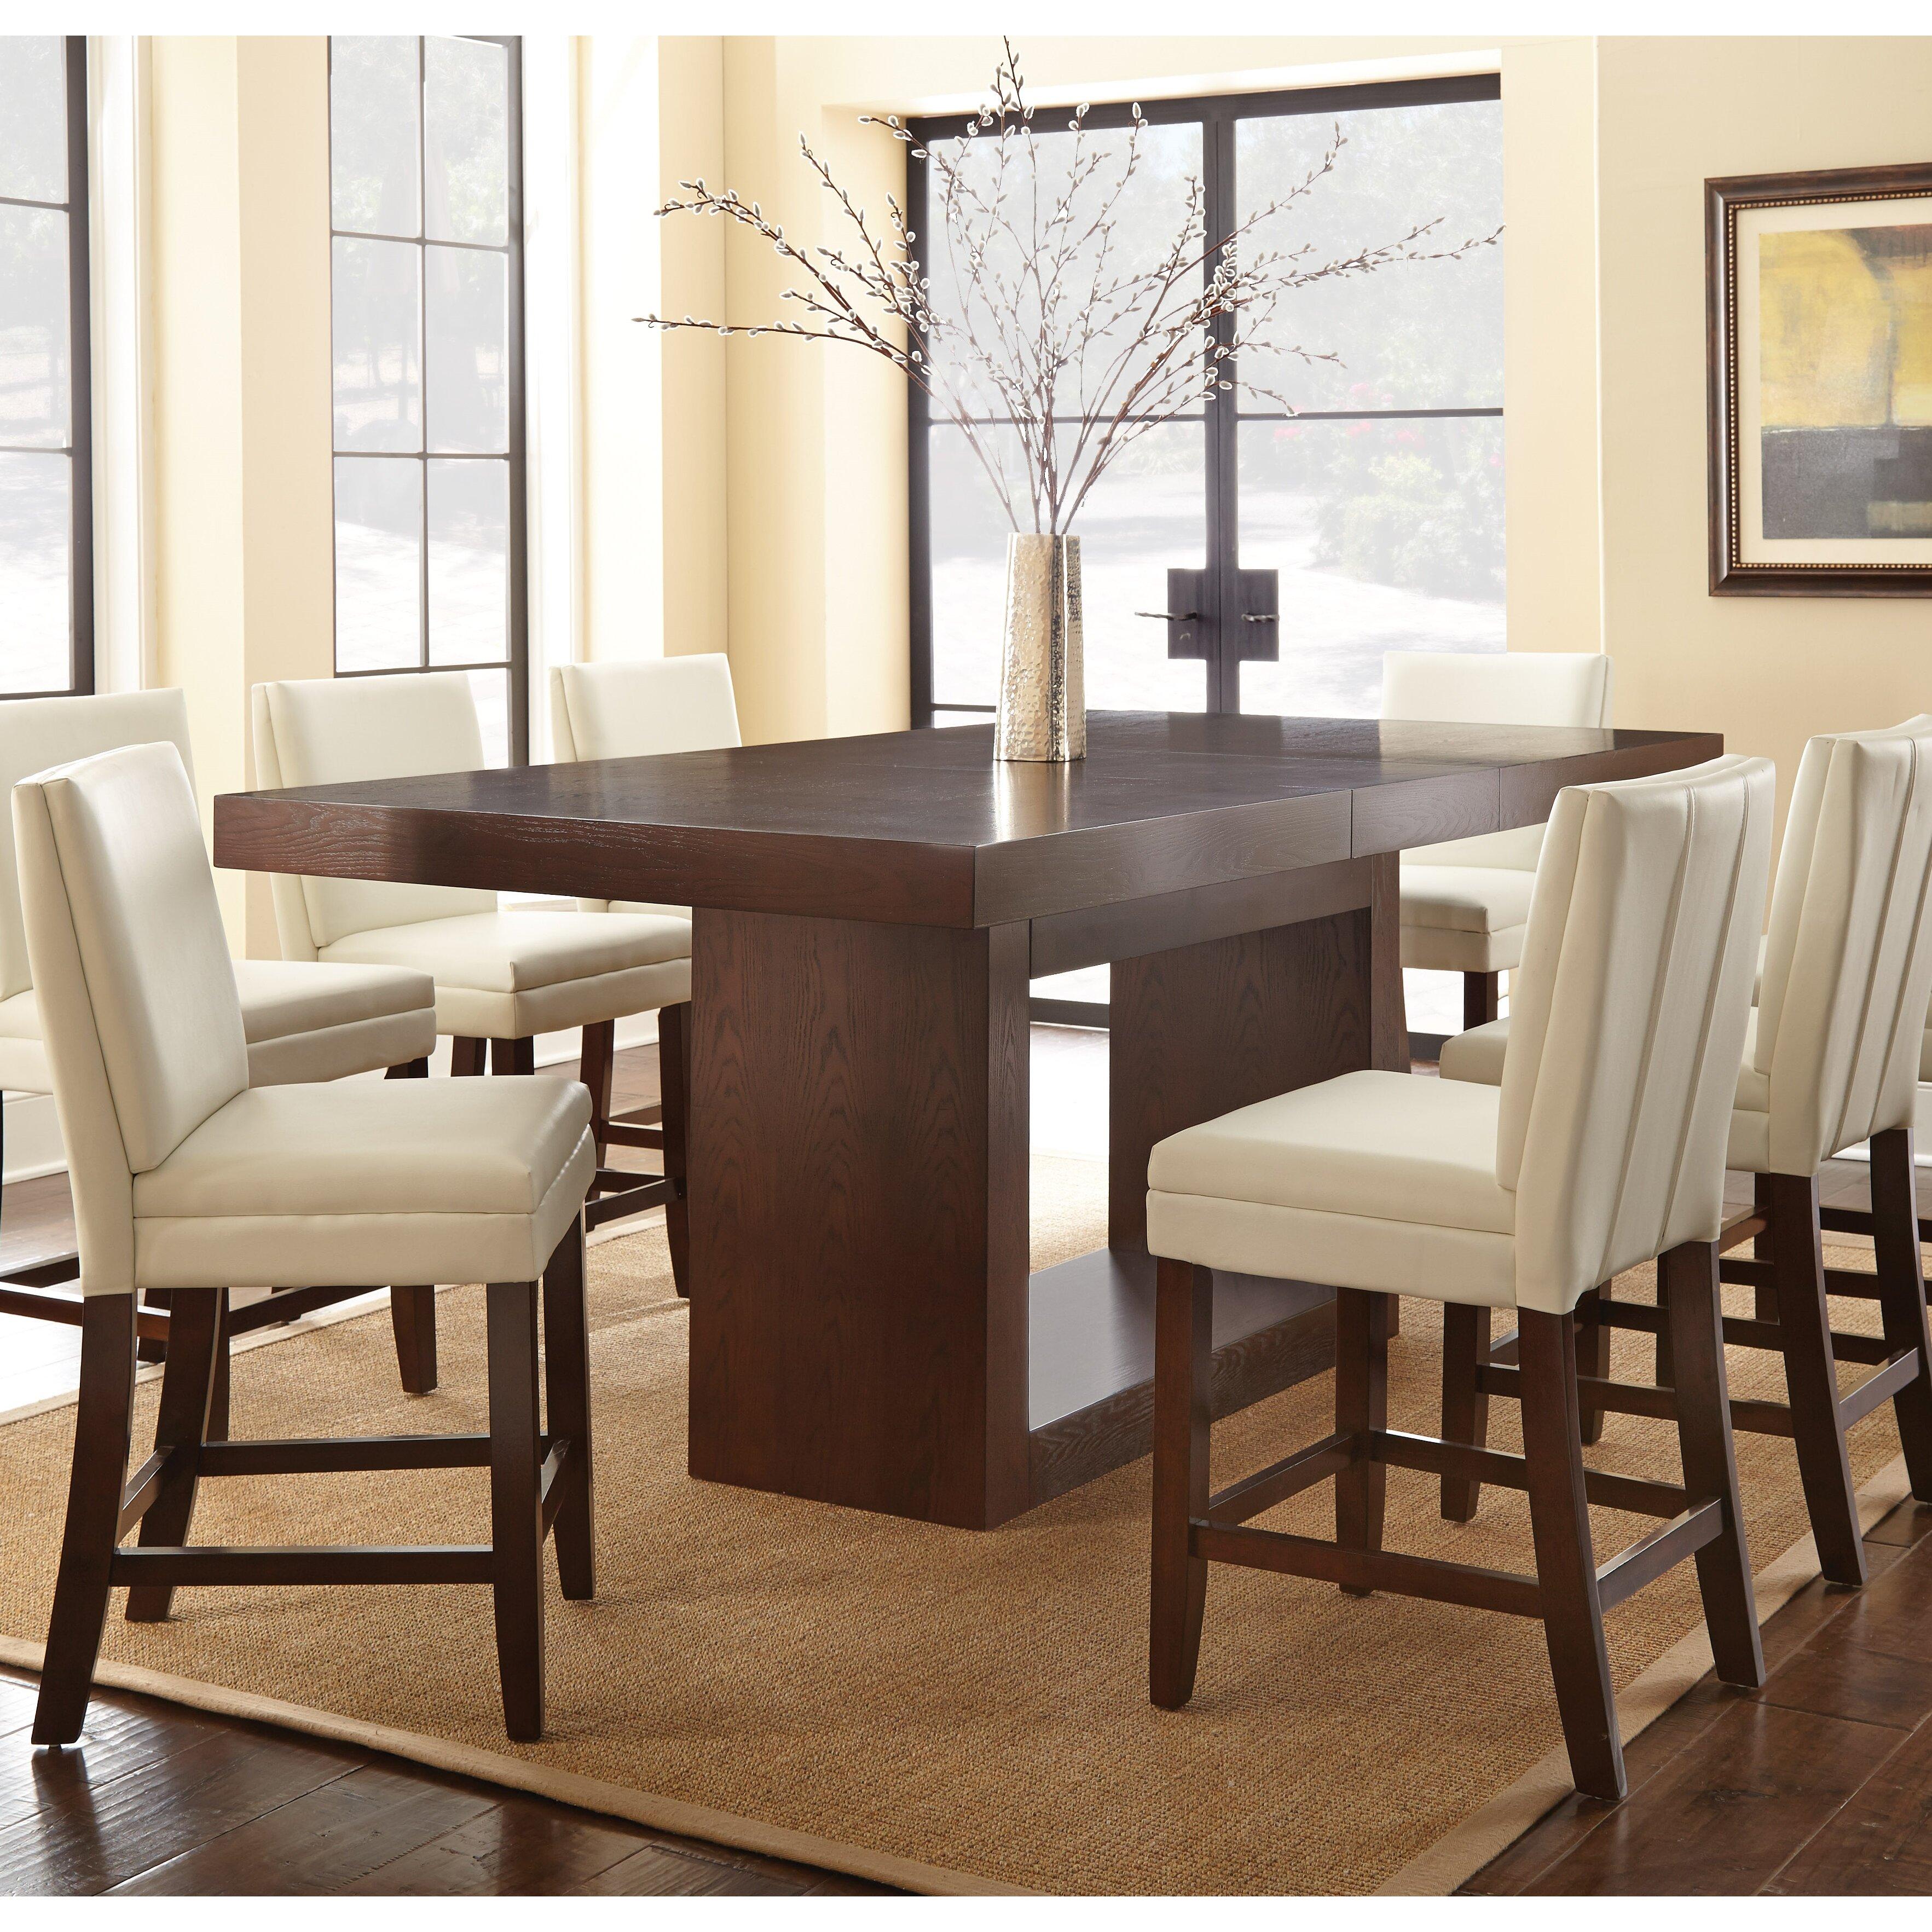 Brayden Studio Mcwhorter Dining Table Reviews: Brayden Studio Antonio Counter Height Dining Table